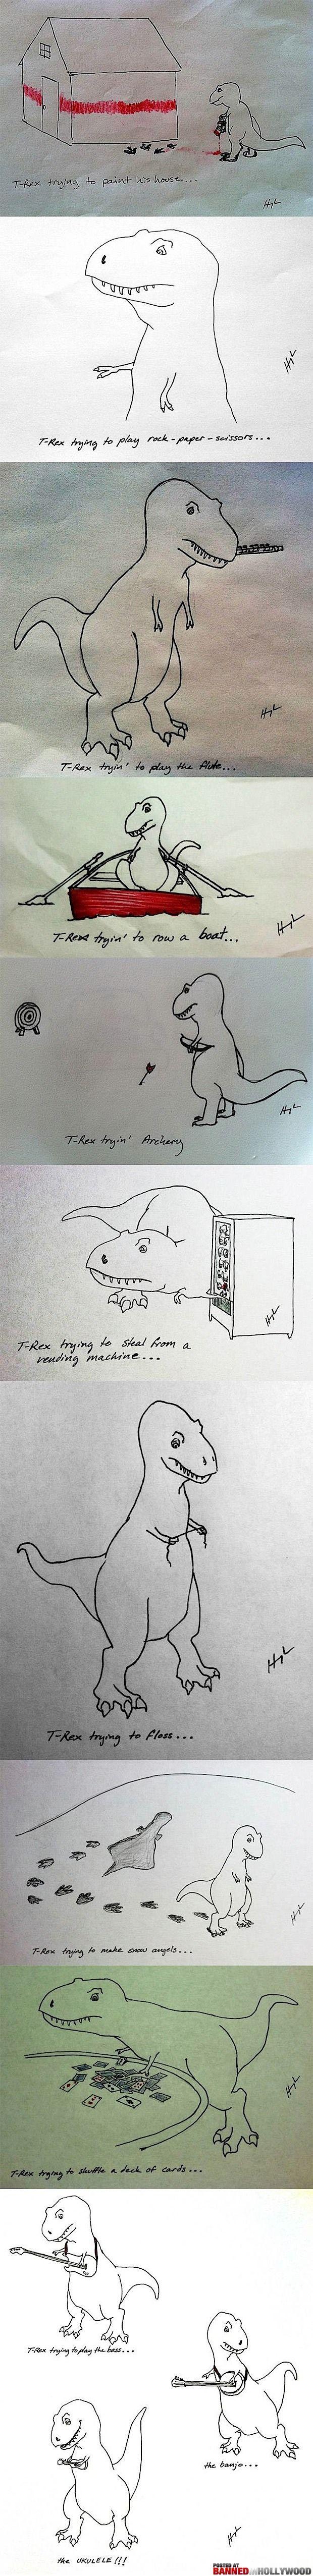 @Lindsay Ash. T-Rex Problems.